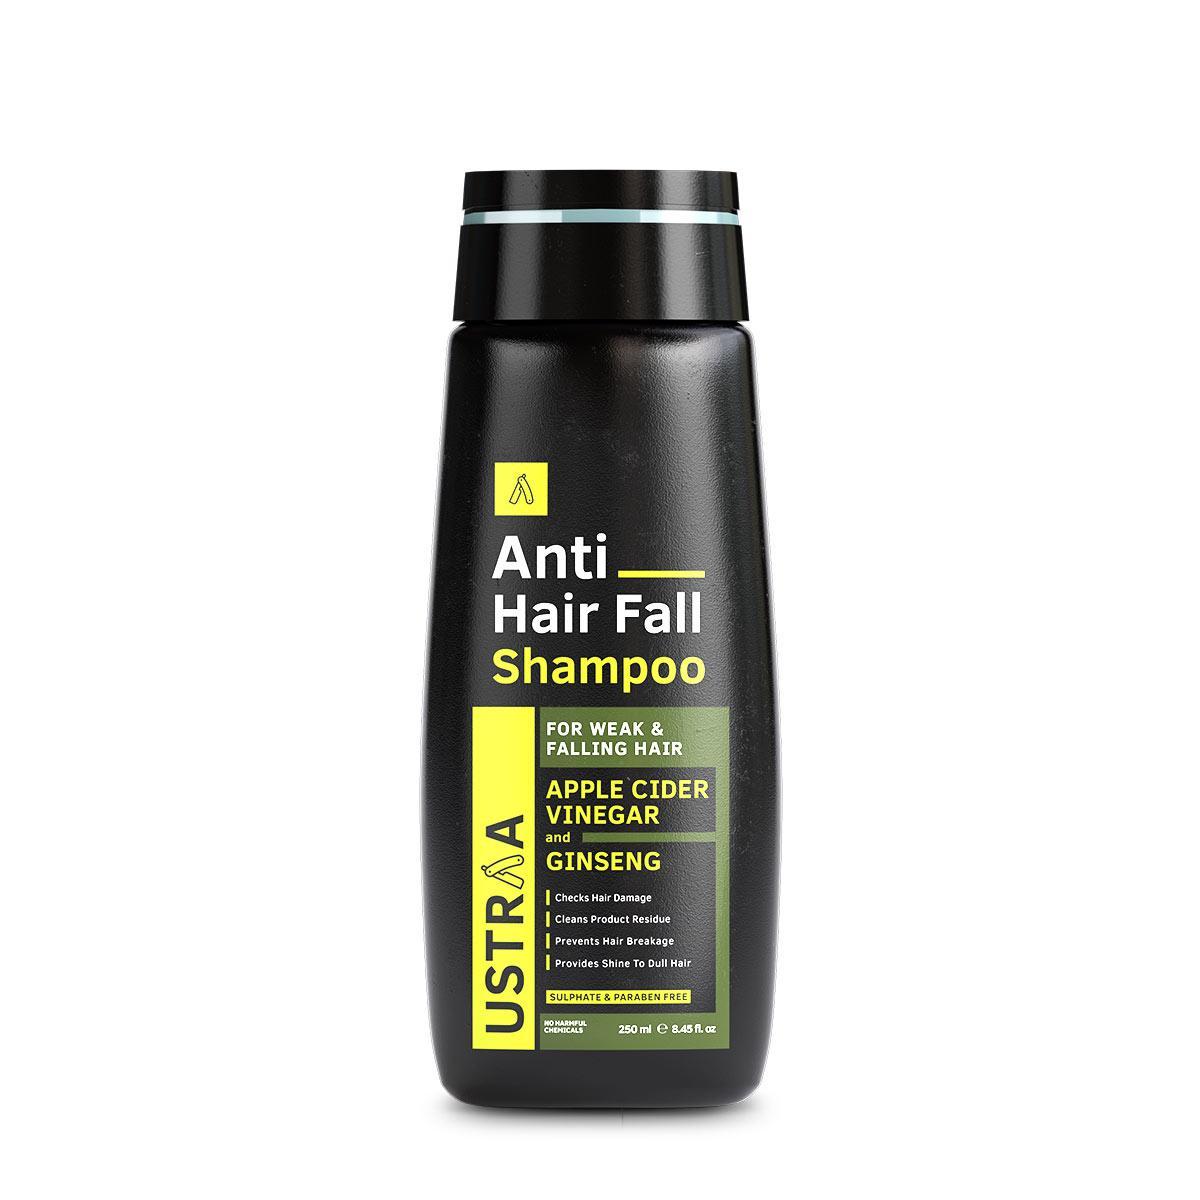 Ustraa Anti Hair Fall Shampoo with Apple Cider Vinegar for Hair Fall Control and Hair Loss Reduction, 250ml